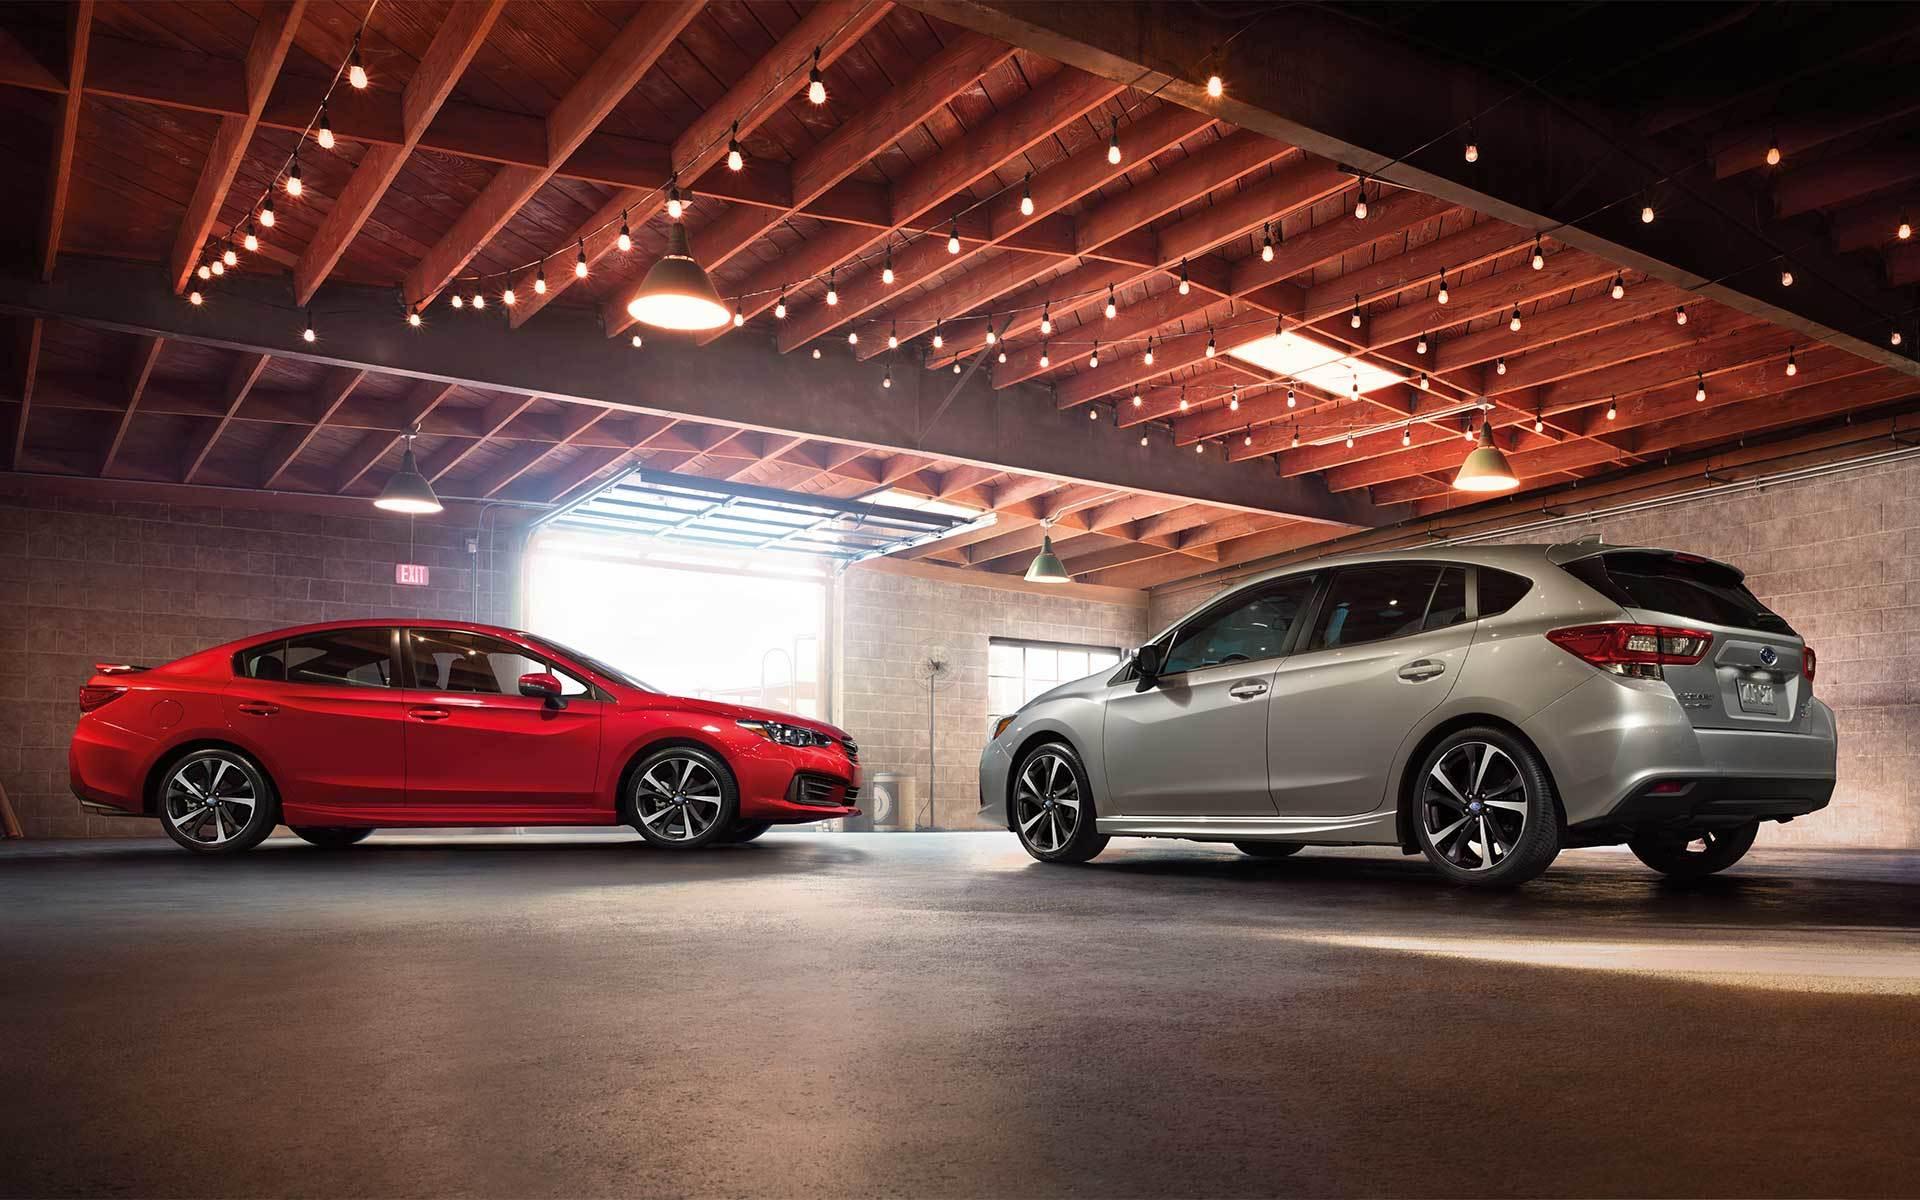 2020 Subaru Impreza Awards